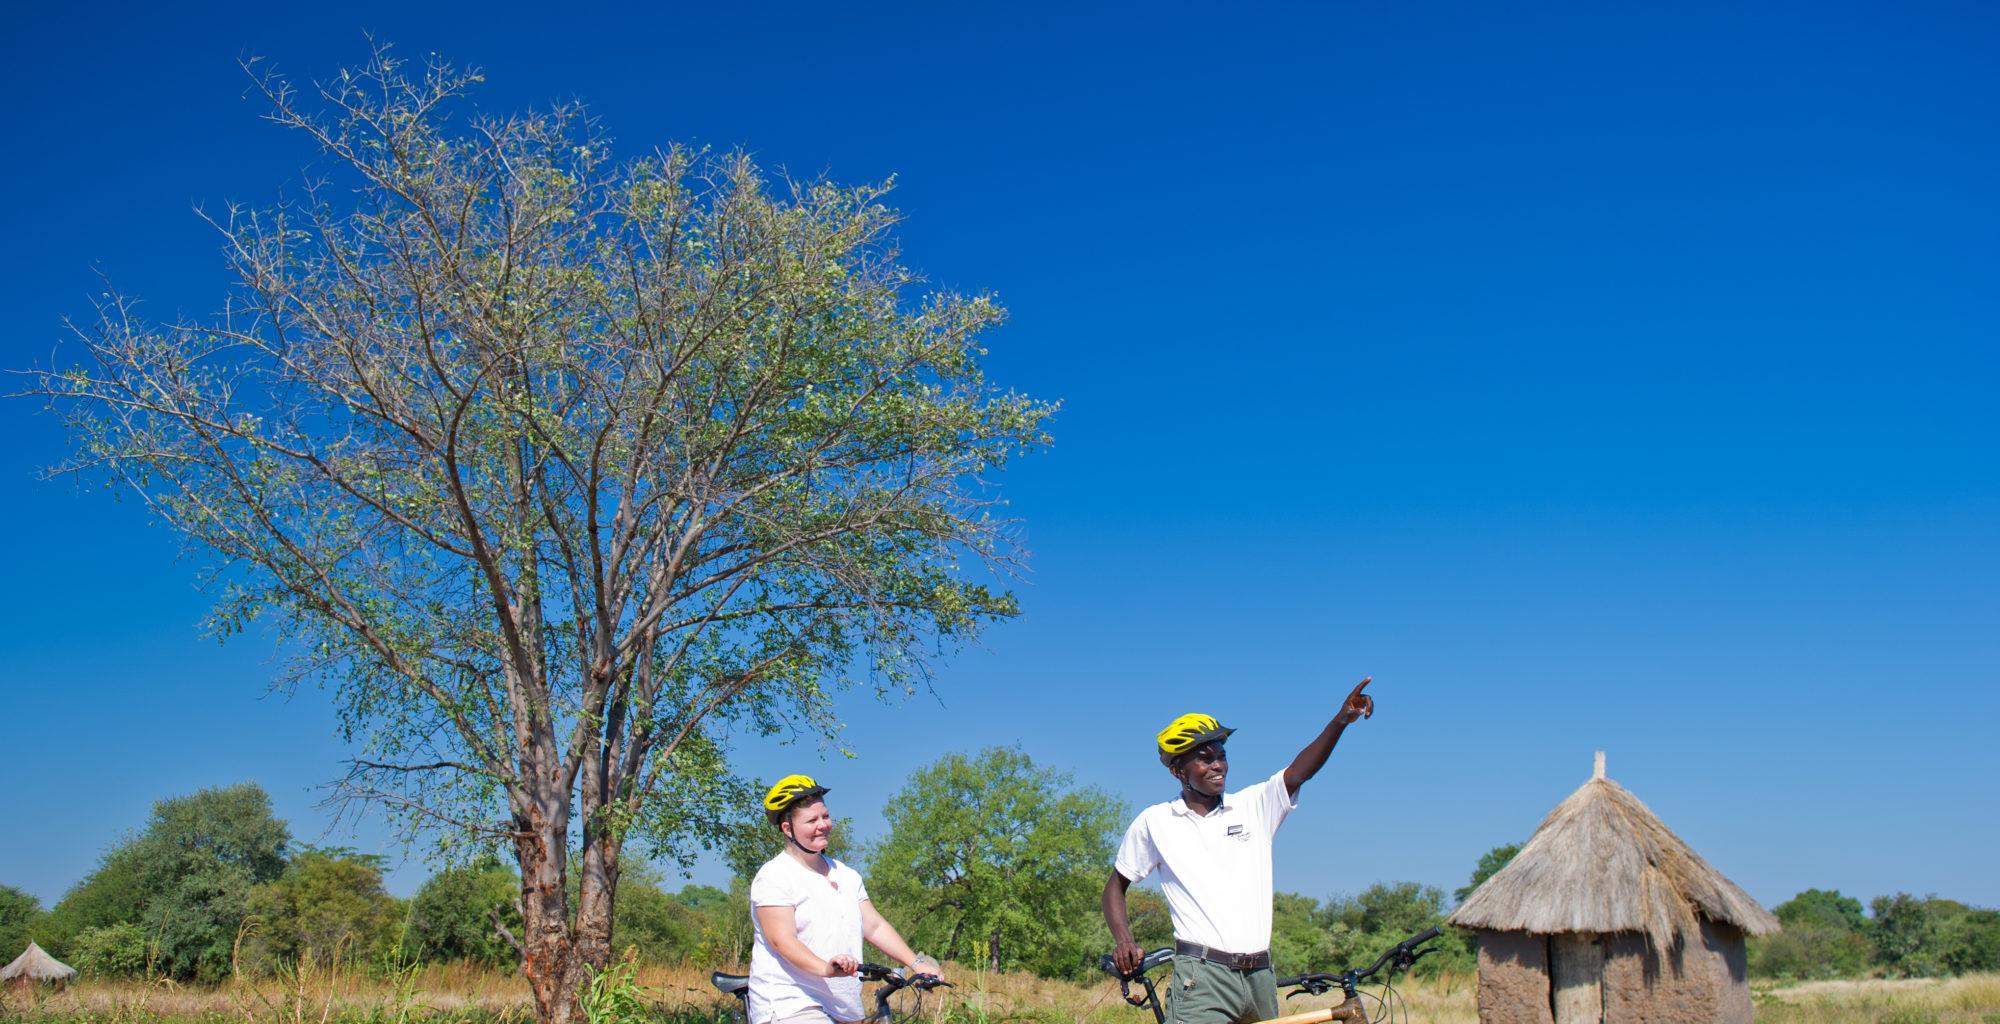 Island-of-Siankaba-Zambia-biking